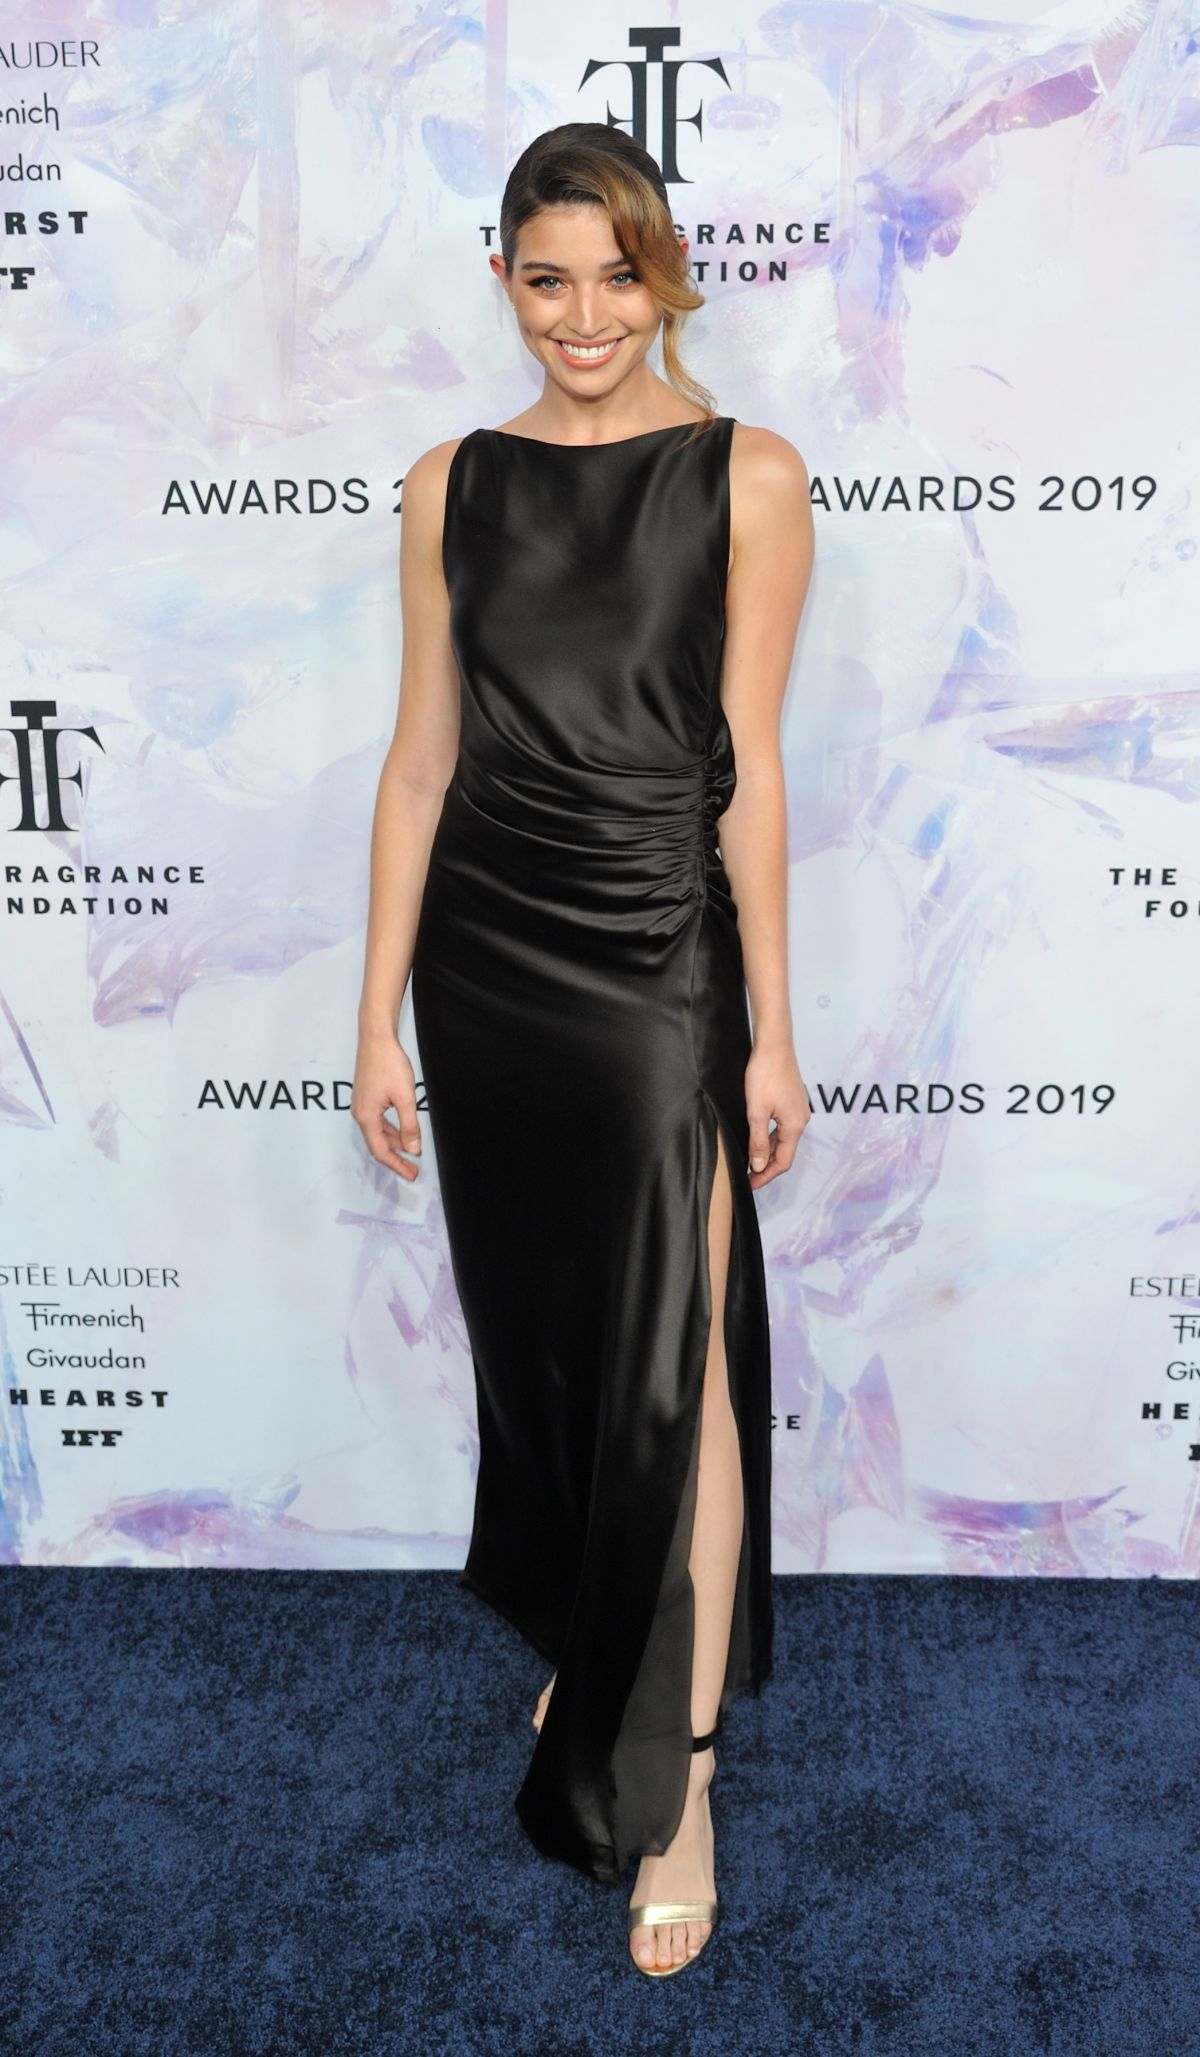 DANIELA LOPEZ OSORIO at Fragrance Foundation Awards in New